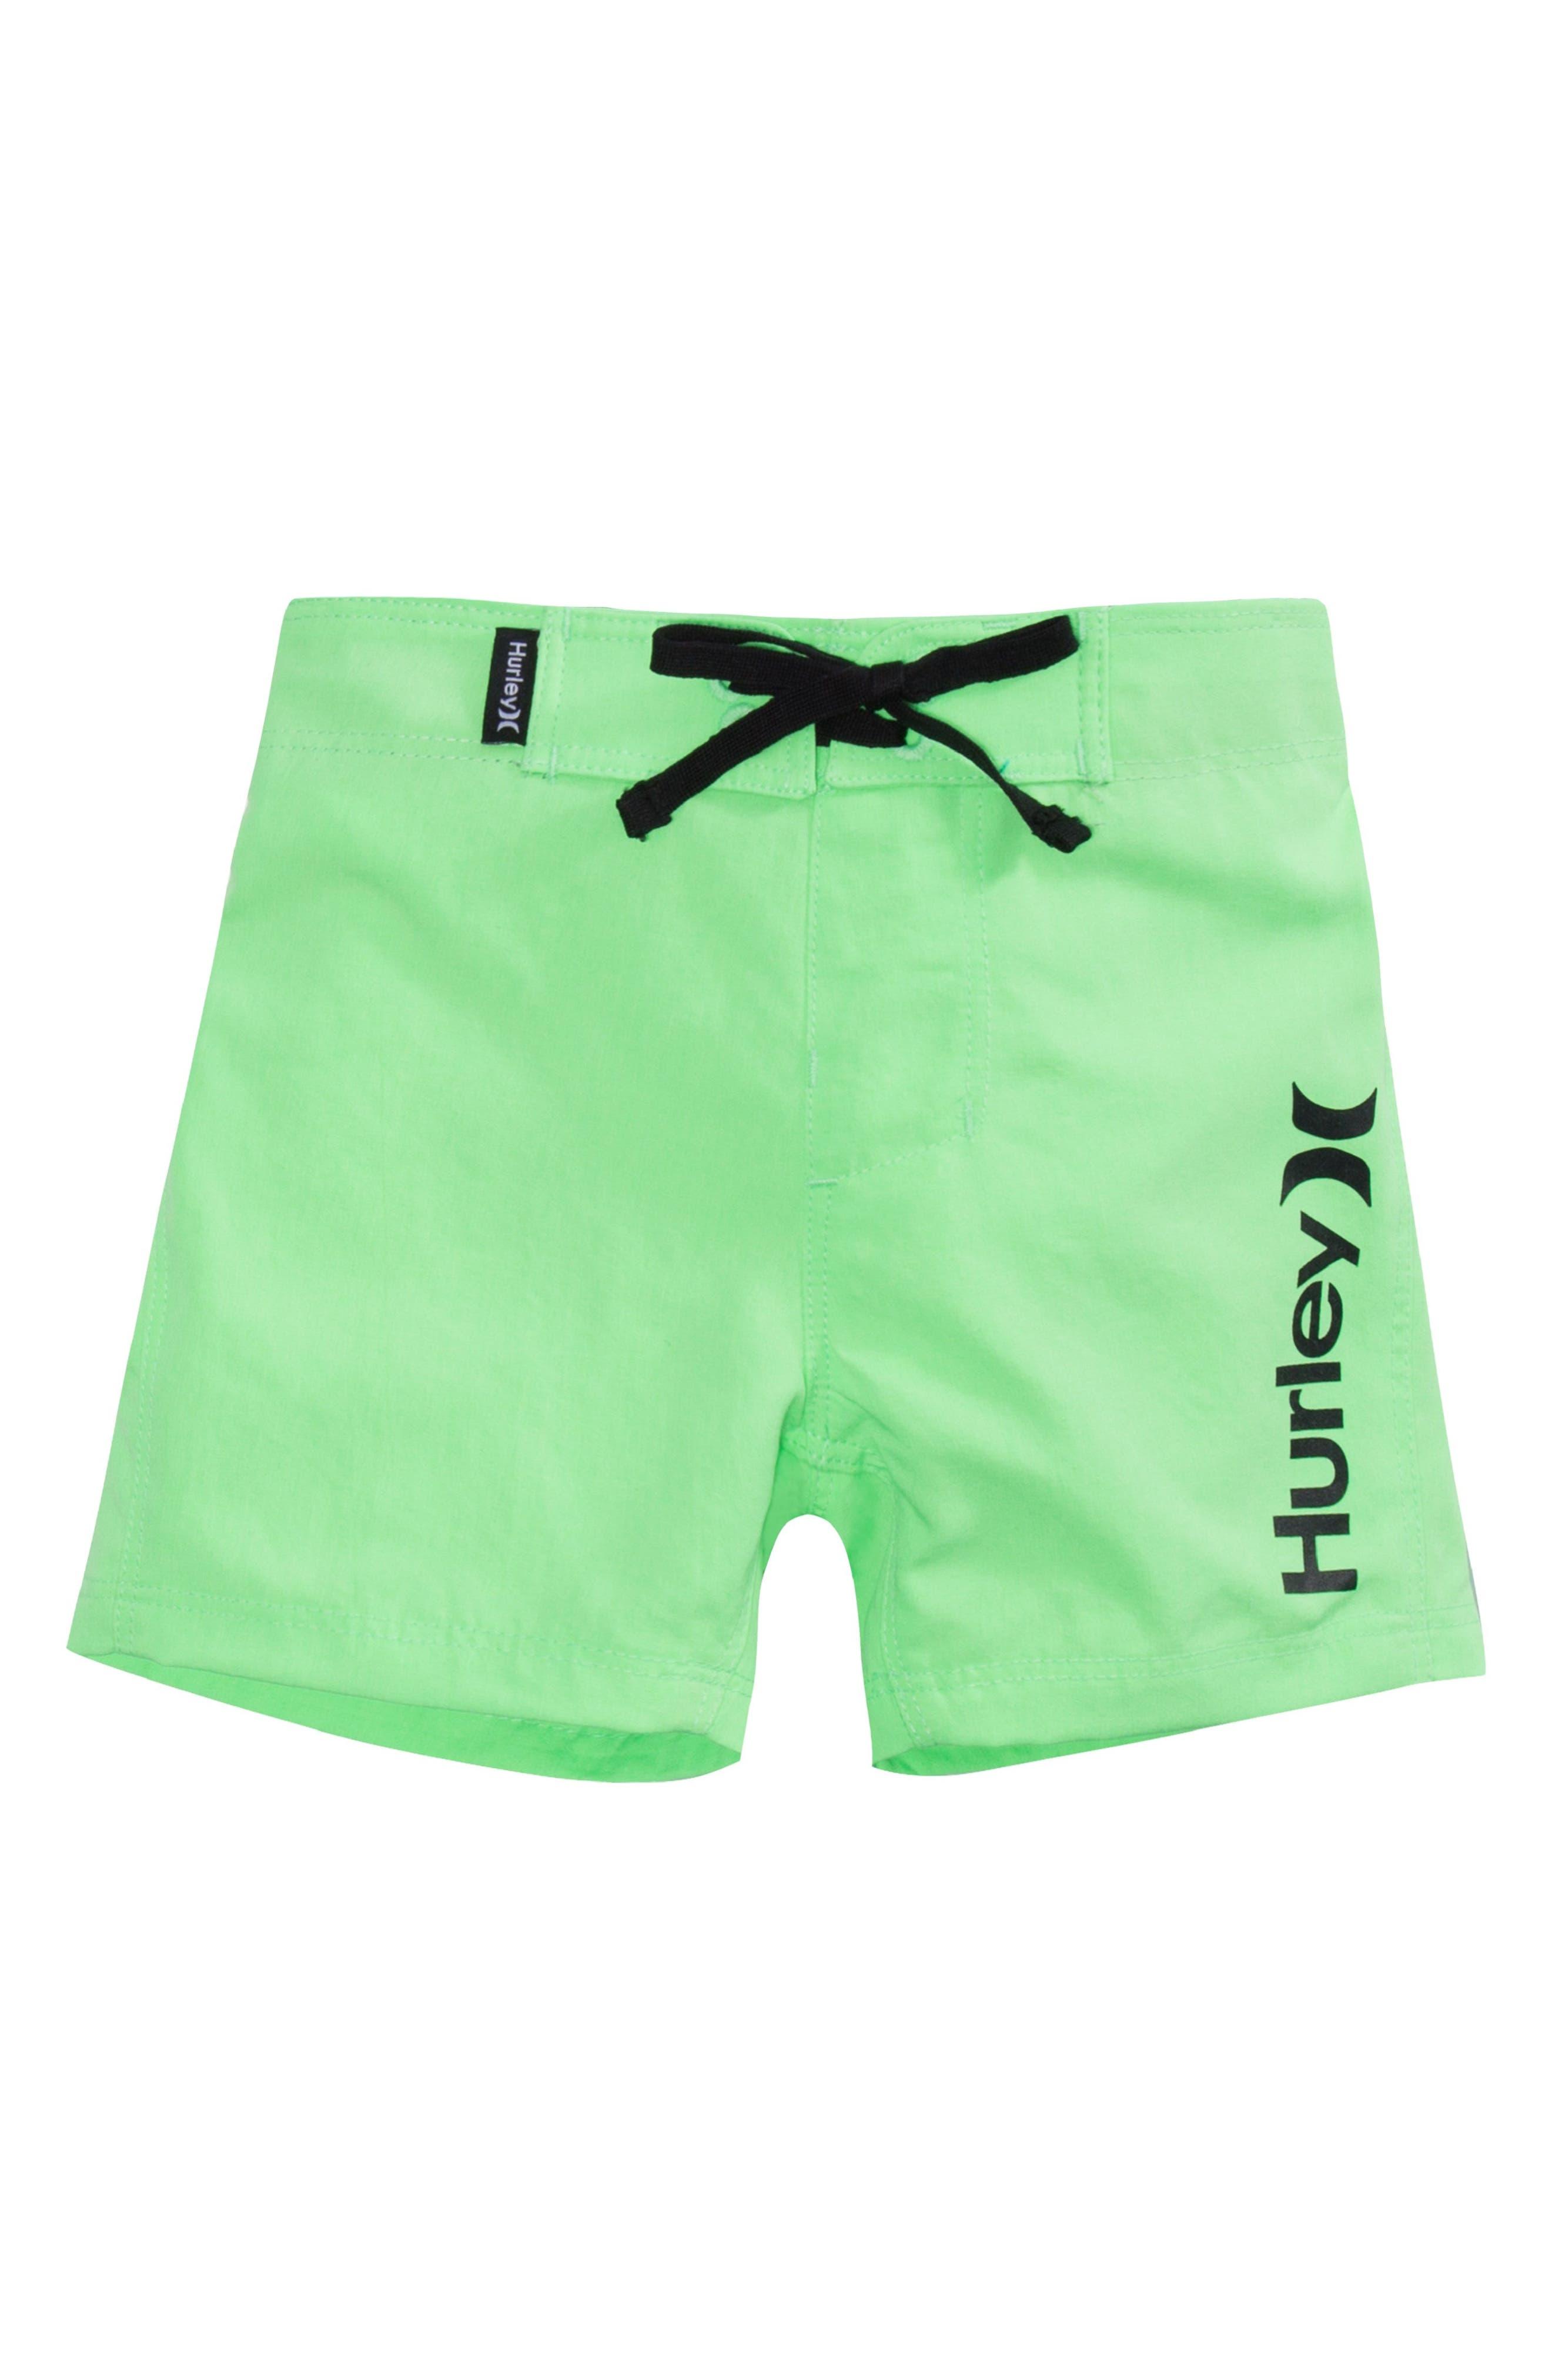 HURLEY Line Up Board Shorts, Main, color, 361